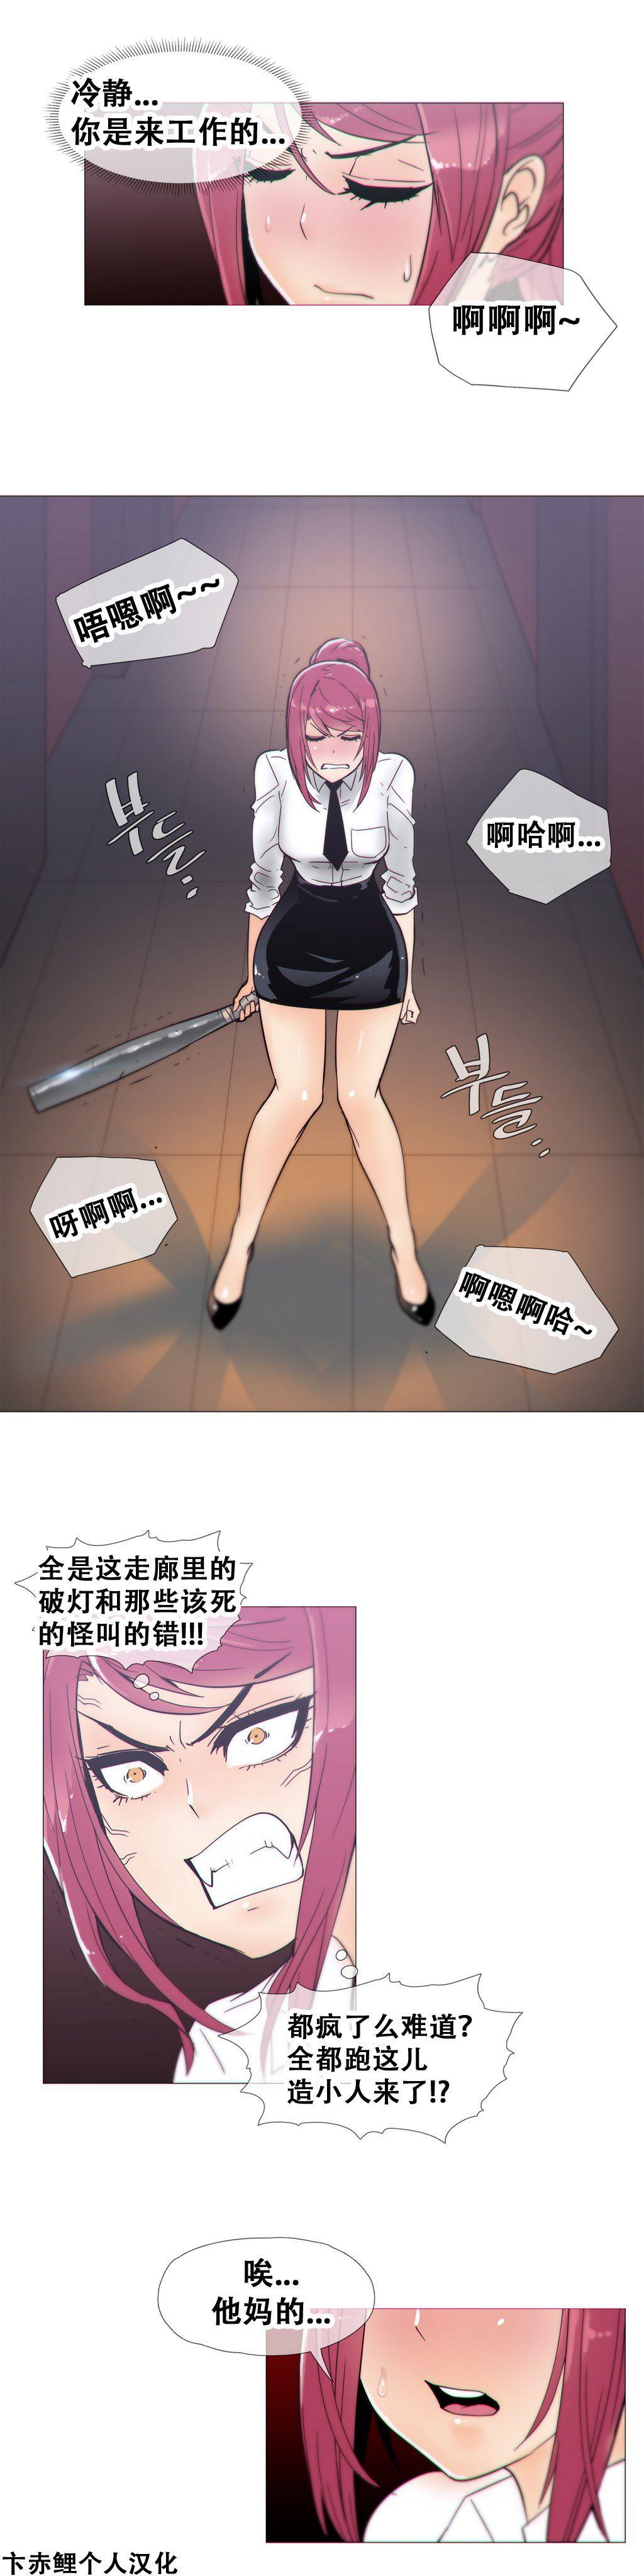 HouseHold Affairs 【卞赤鲤个人汉化】1~21话(持续更新中) 308